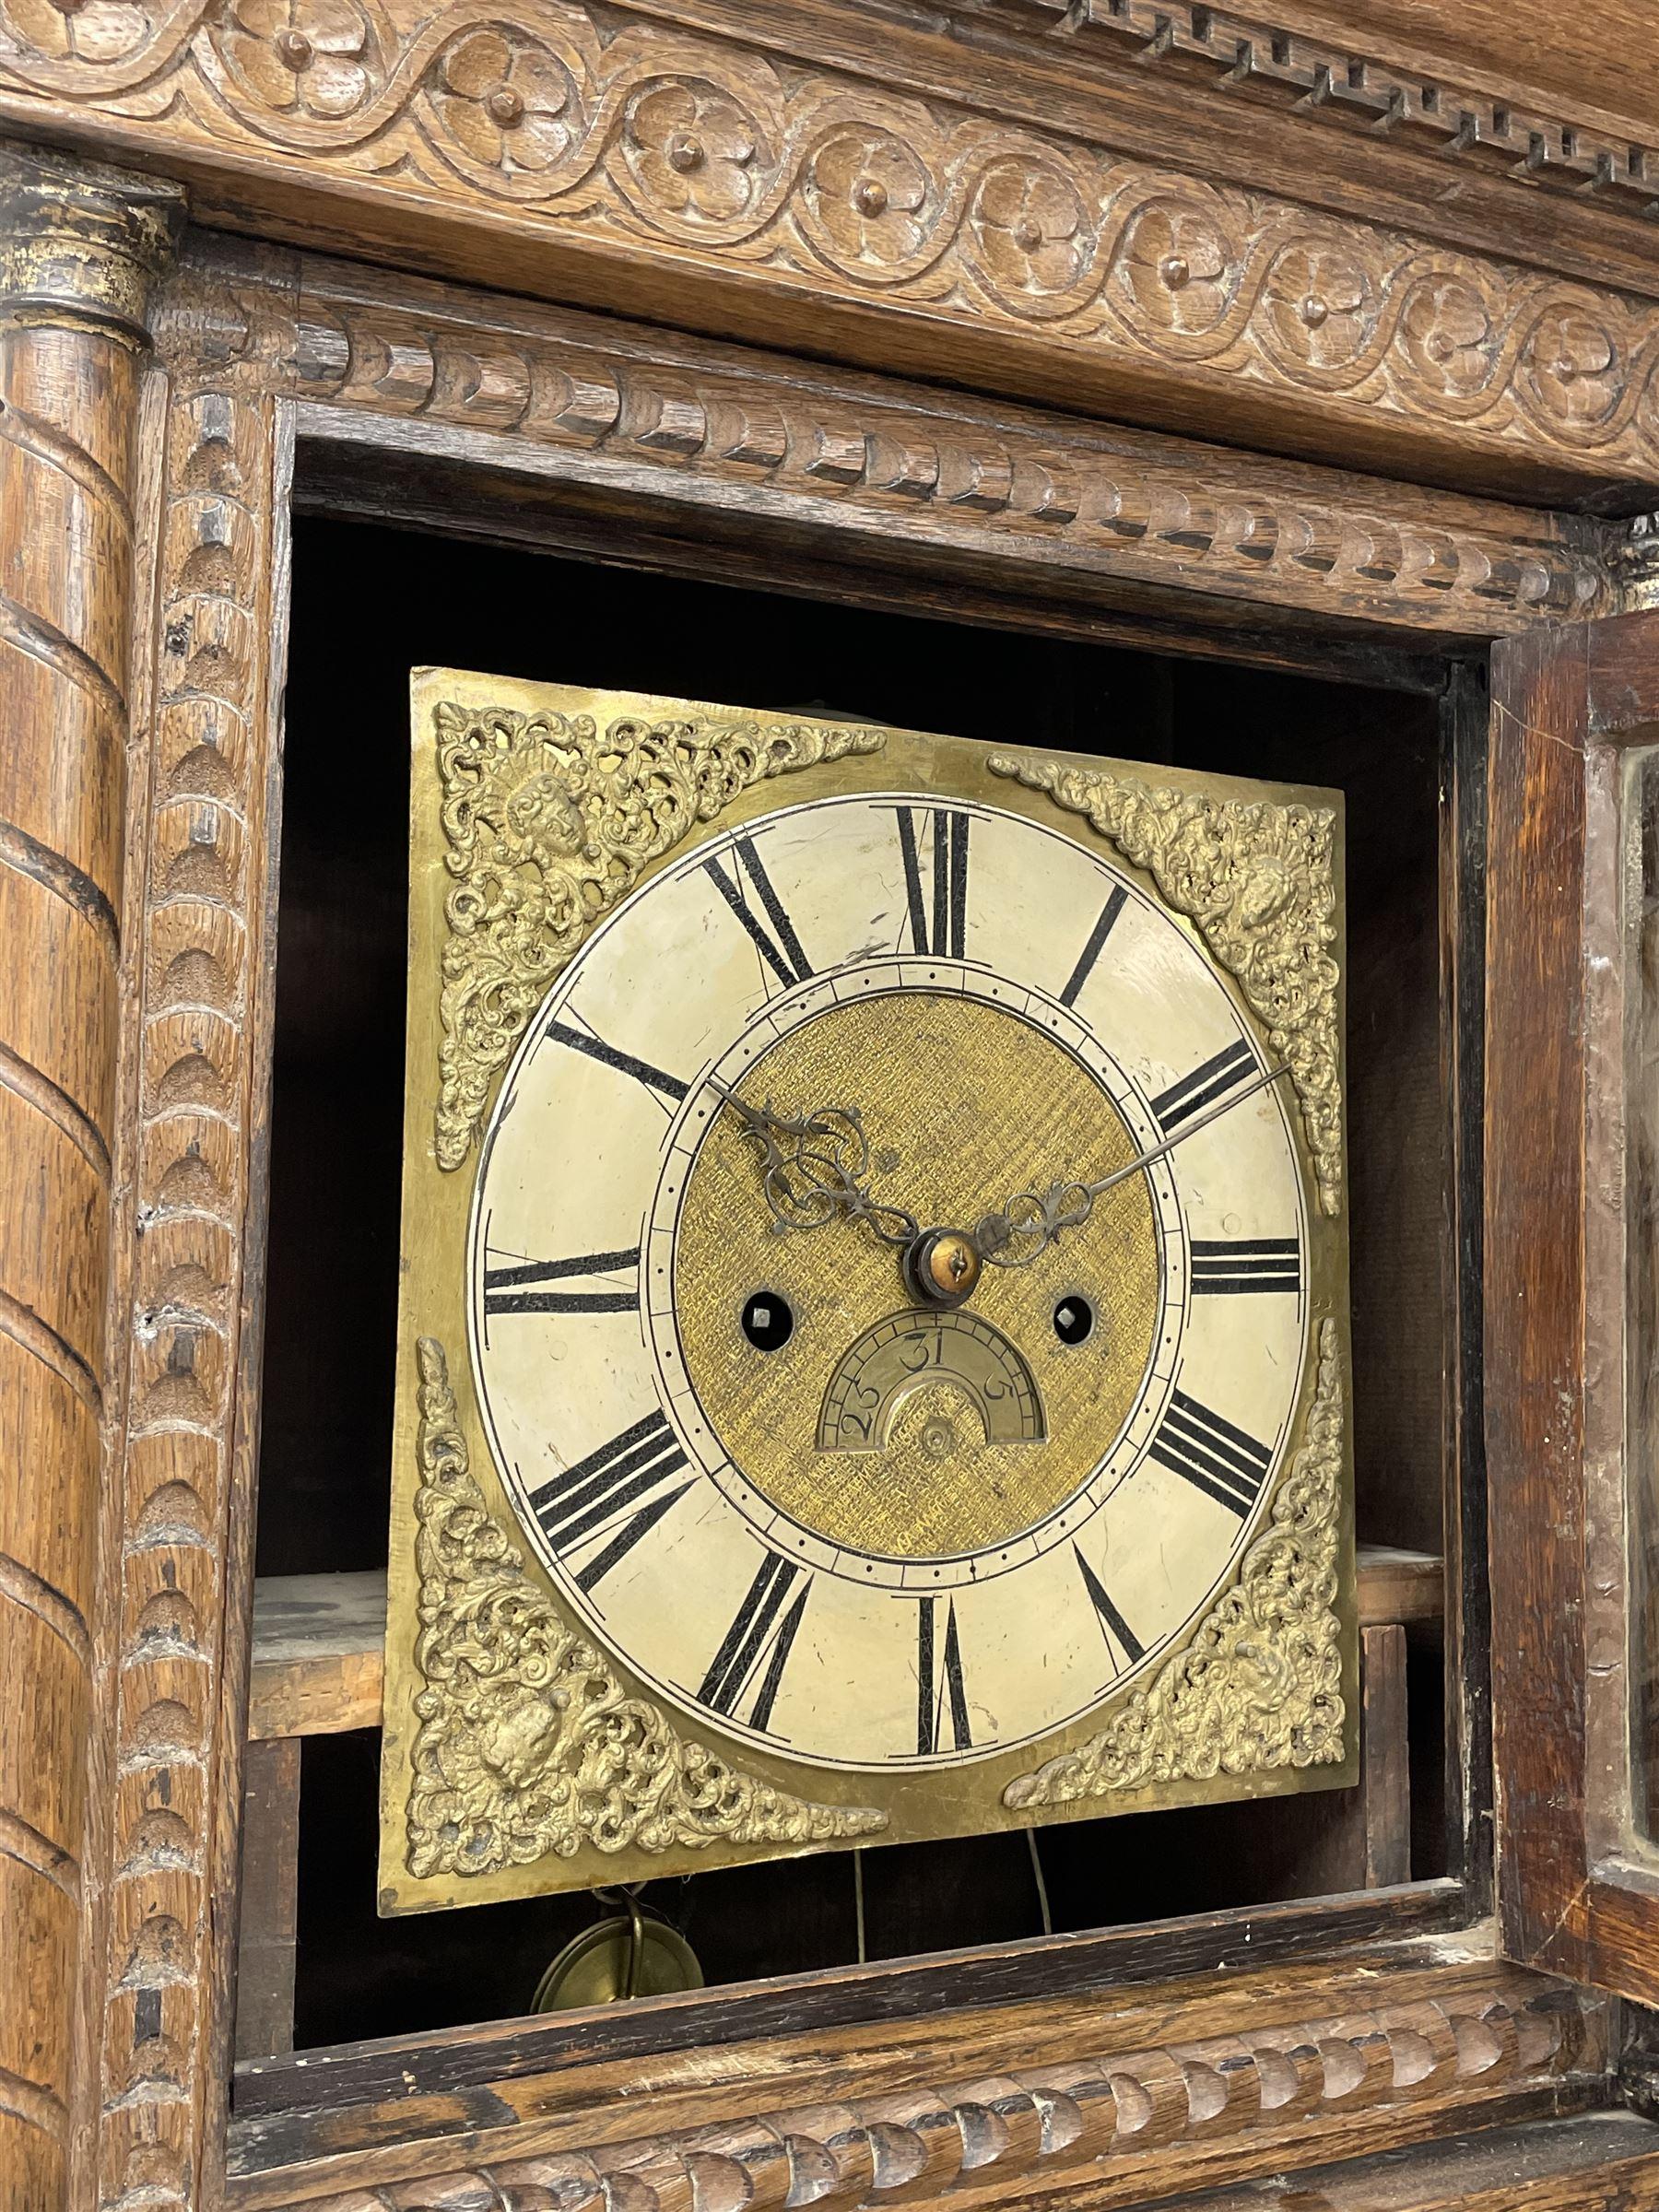 19th century carved oak longcase clock - Image 5 of 10